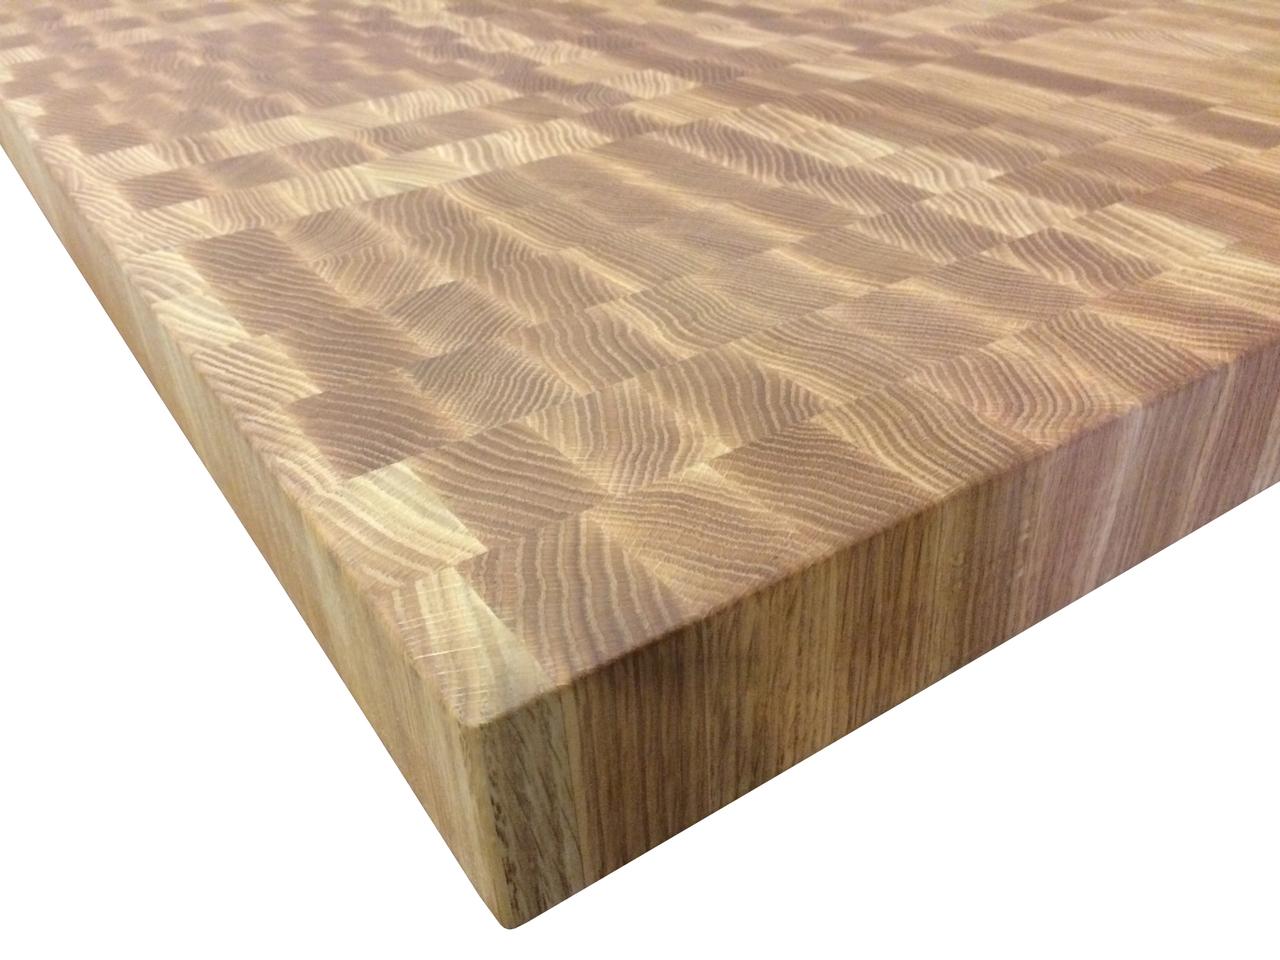 Armani Fine Woodworking End Grain Red Oak Butcher Block Countertop